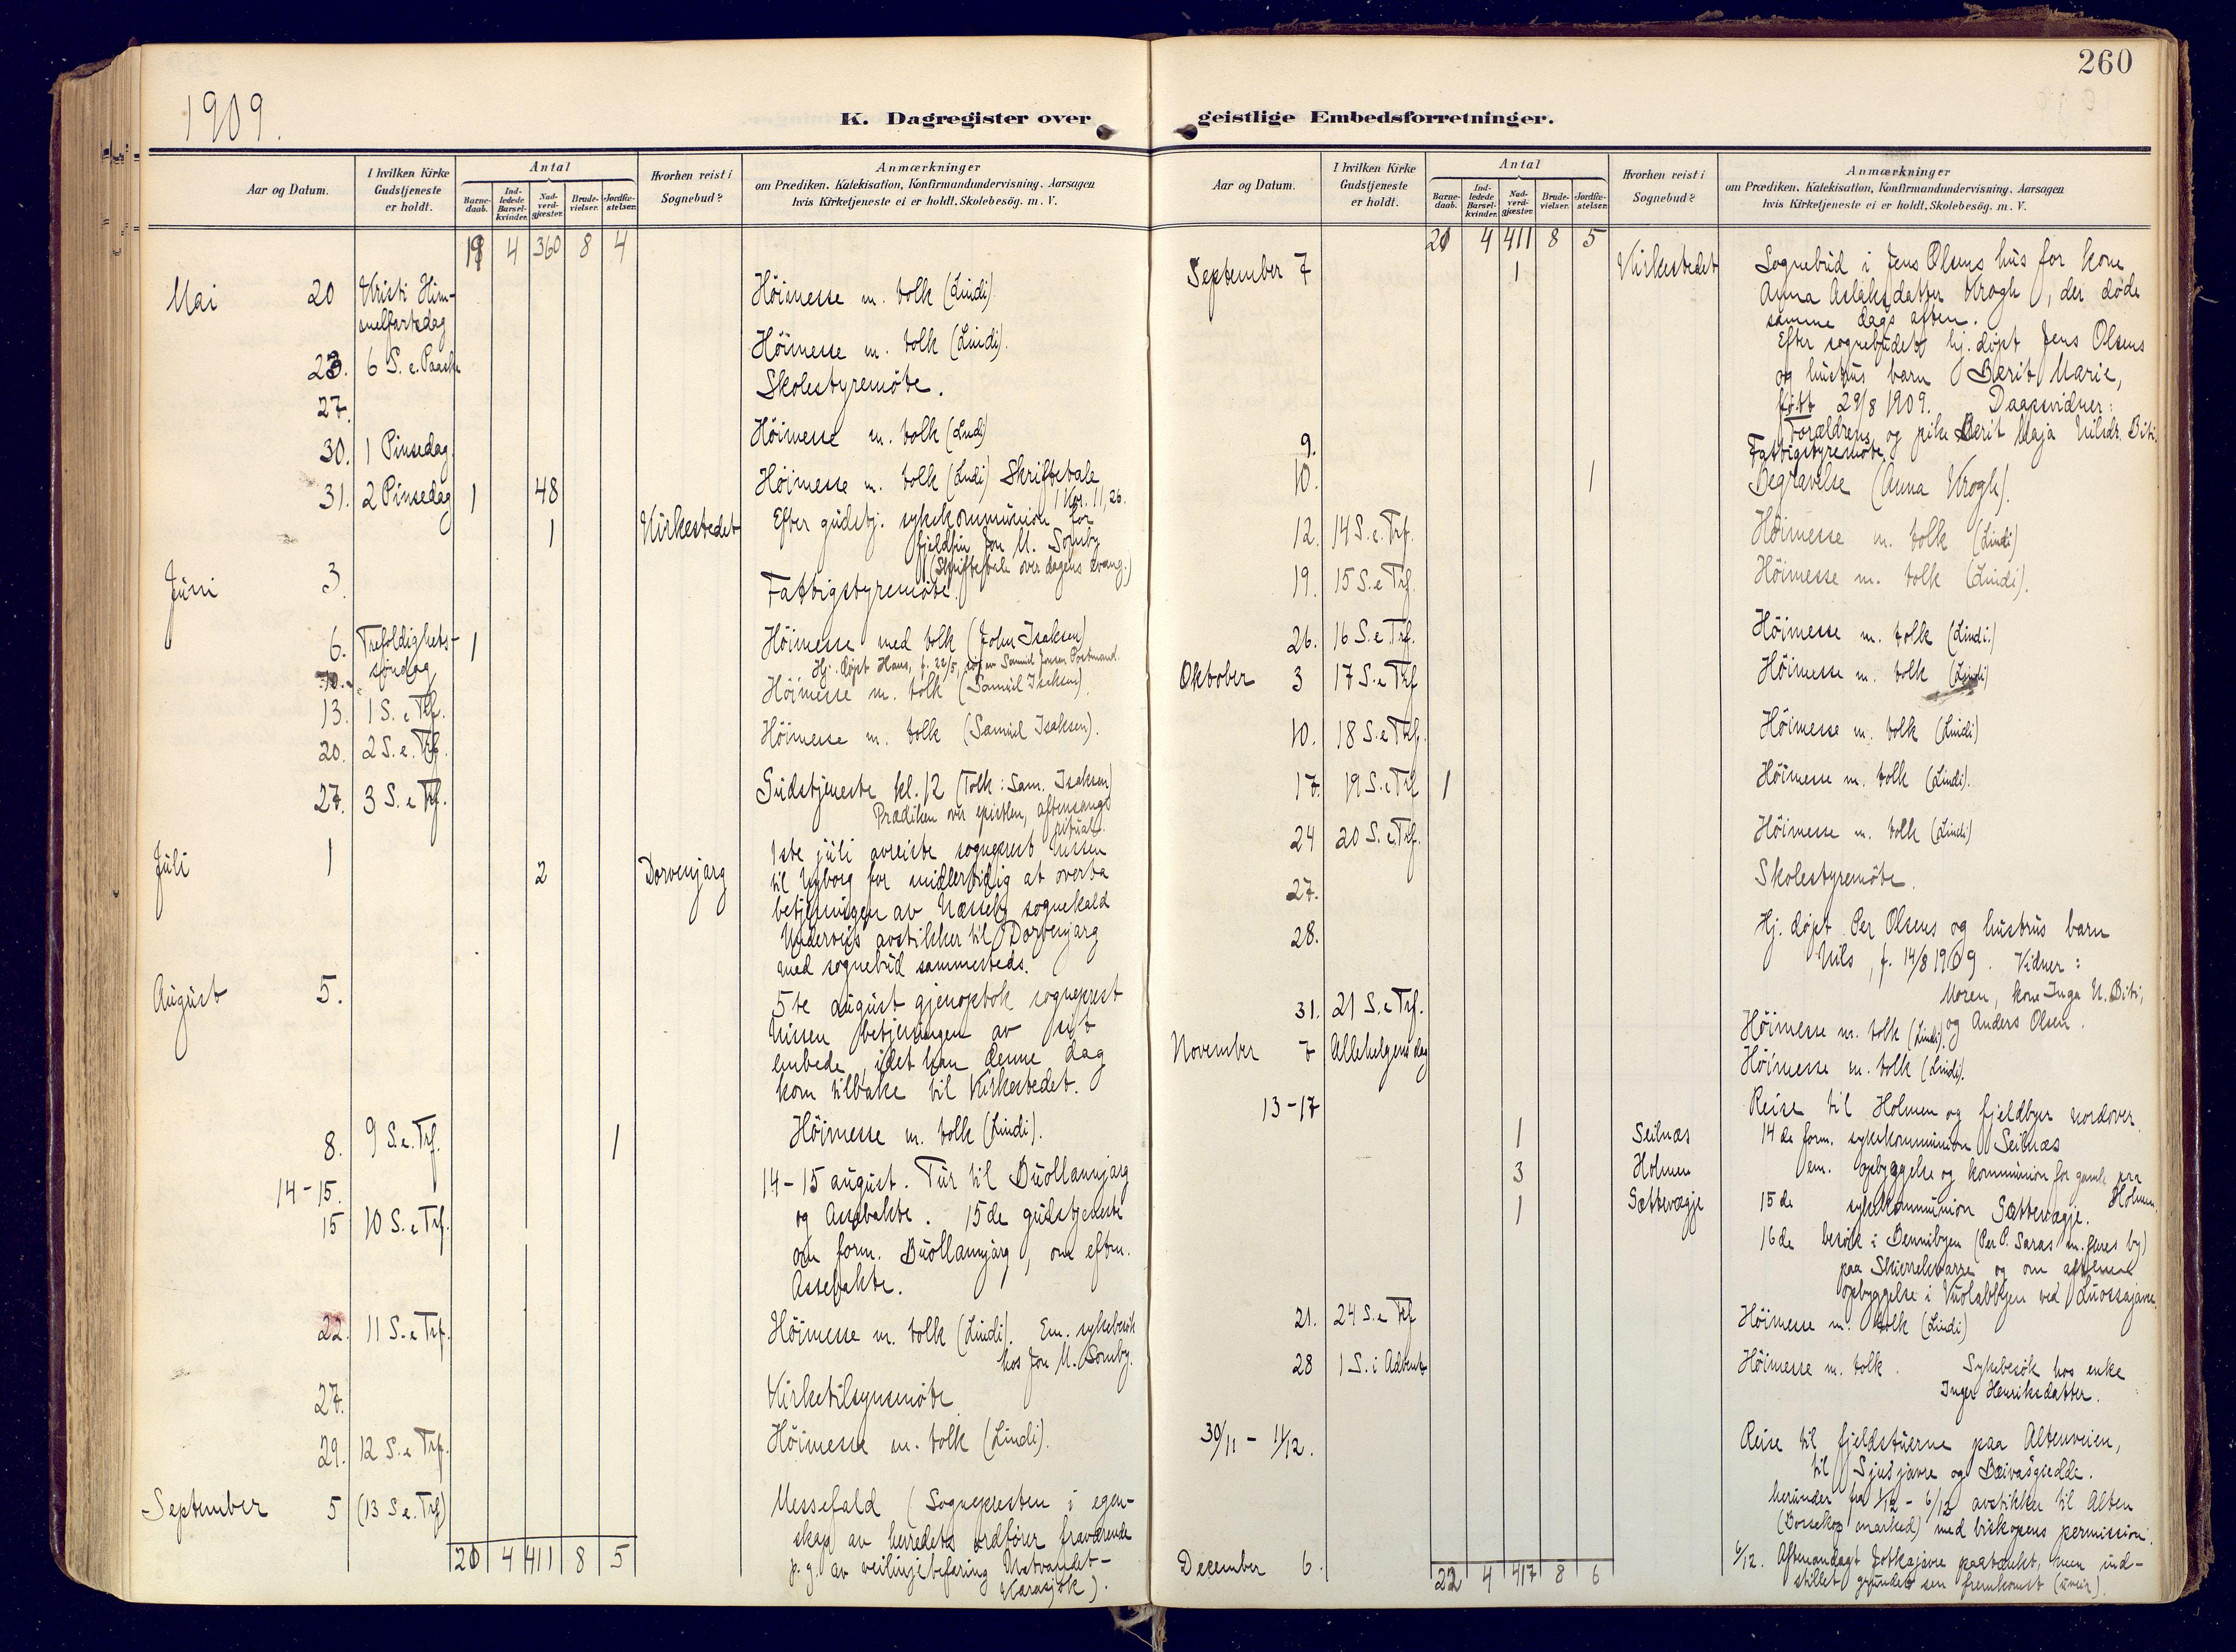 SATØ, Karasjok sokneprestkontor, H/Ha: Ministerialbok nr. 3, 1907-1926, s. 260